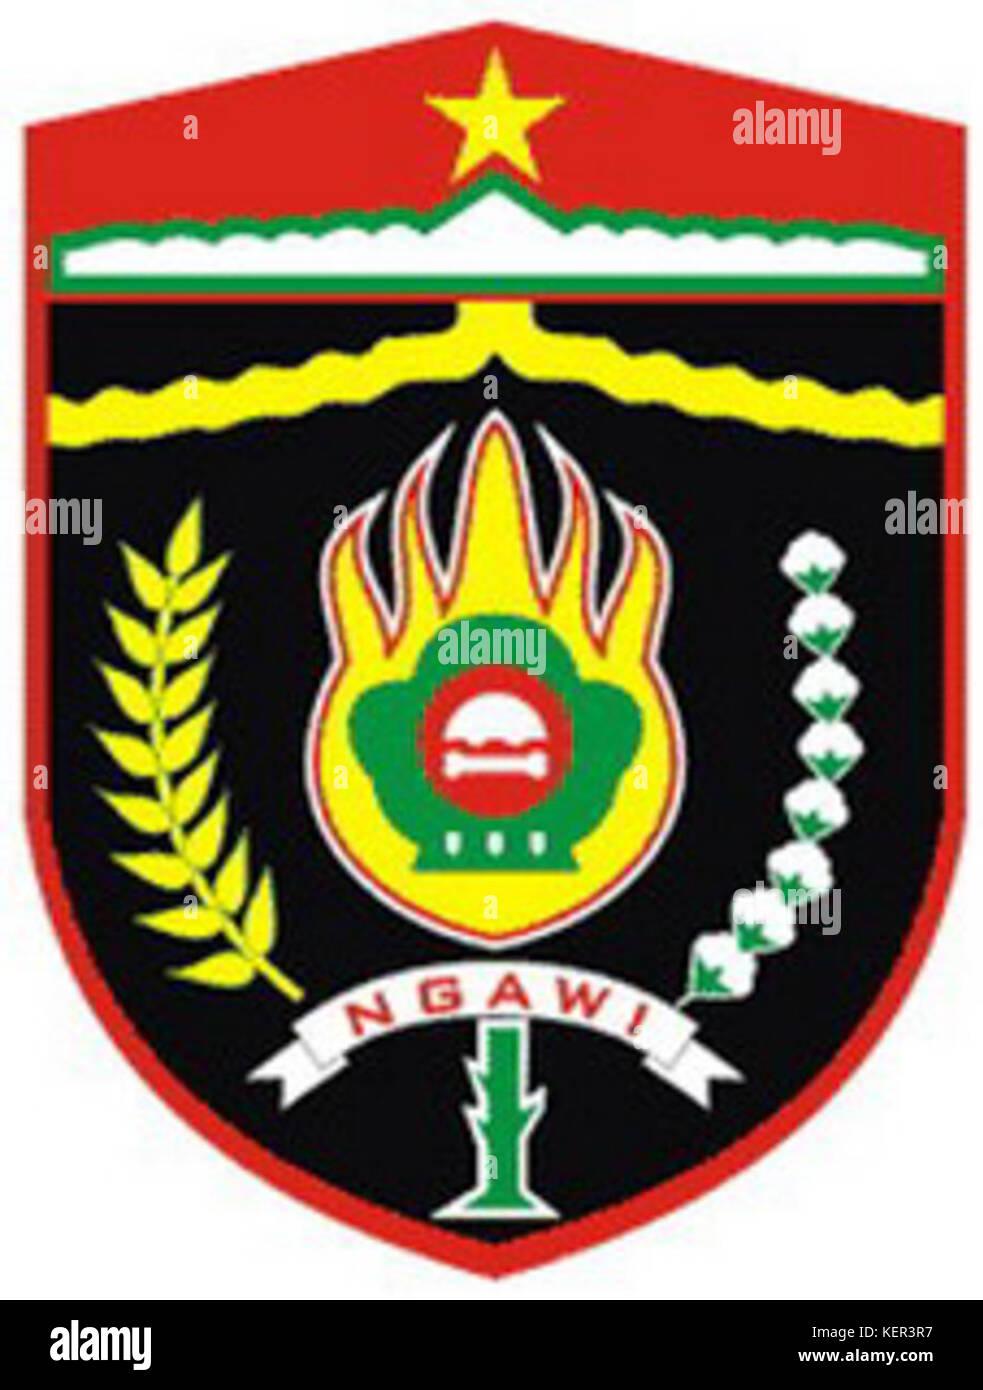 Logo Kabupaten Madiun : kabupaten, madiun, Ngawi, Resolution, Stock, Photography, Images, Alamy